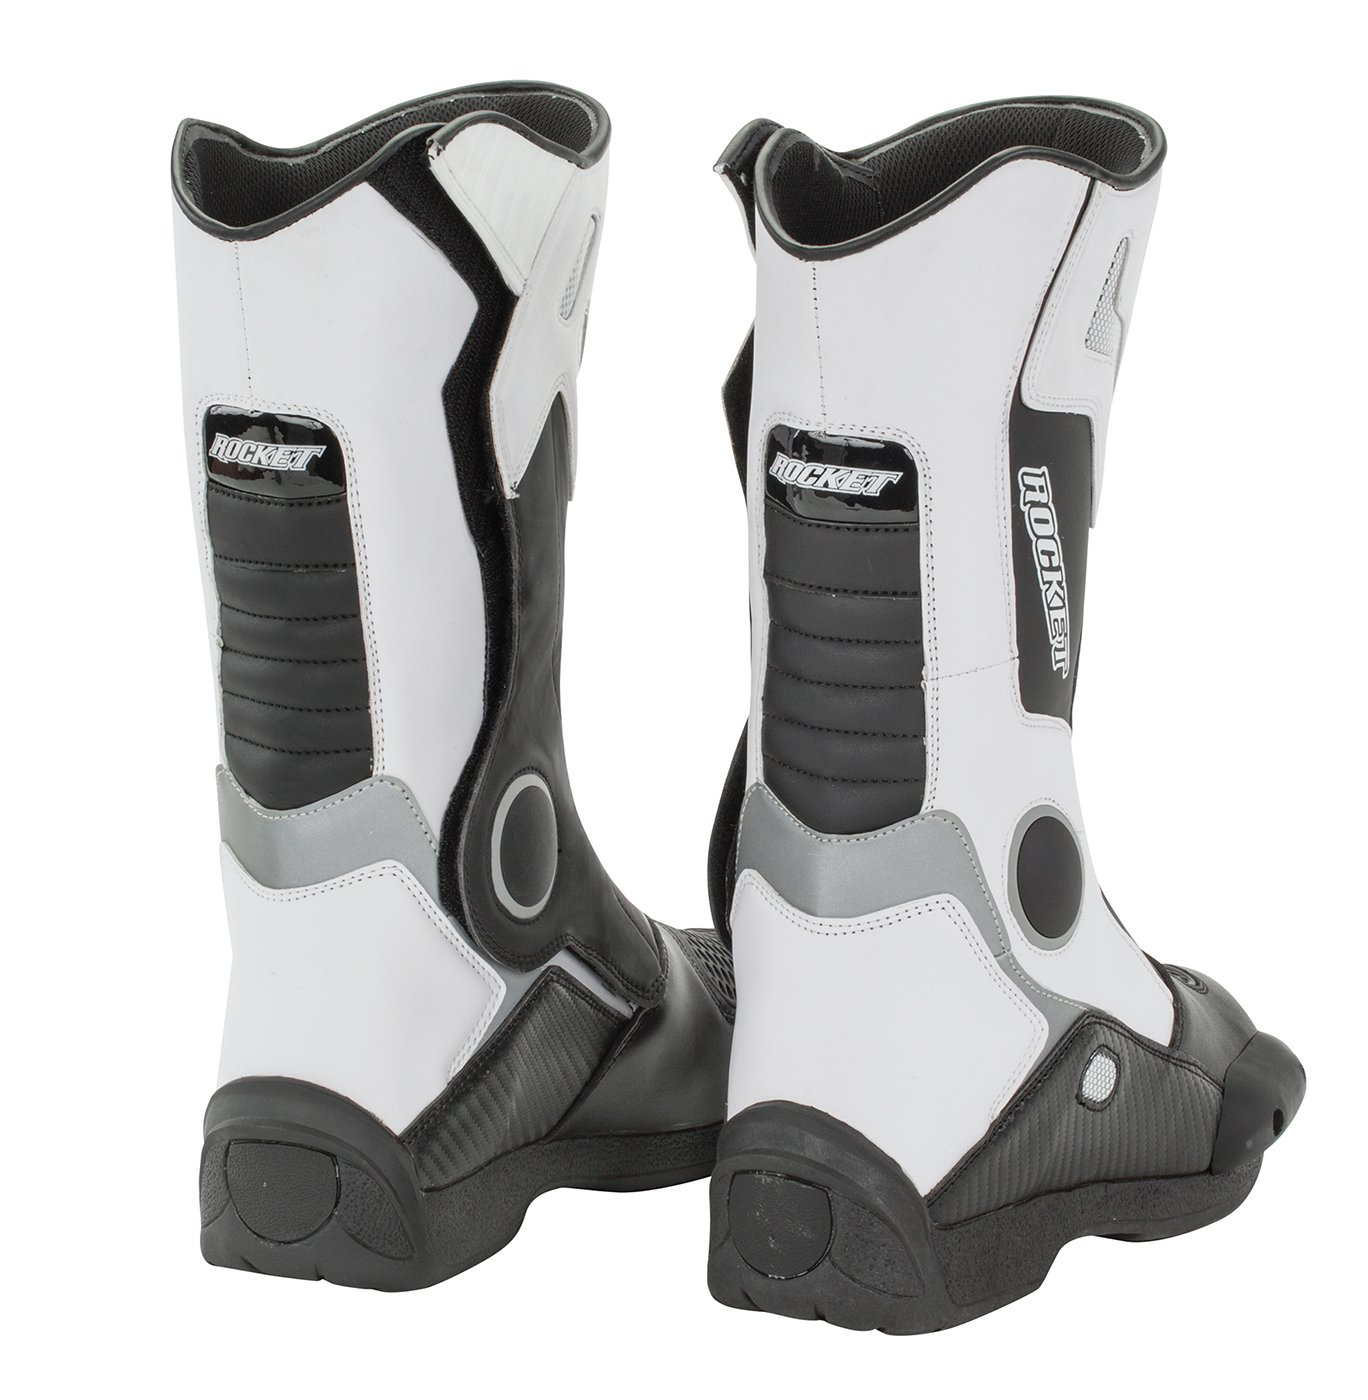 Joe Rocket Mens Water Resistant Touring Boot White, US Size 10